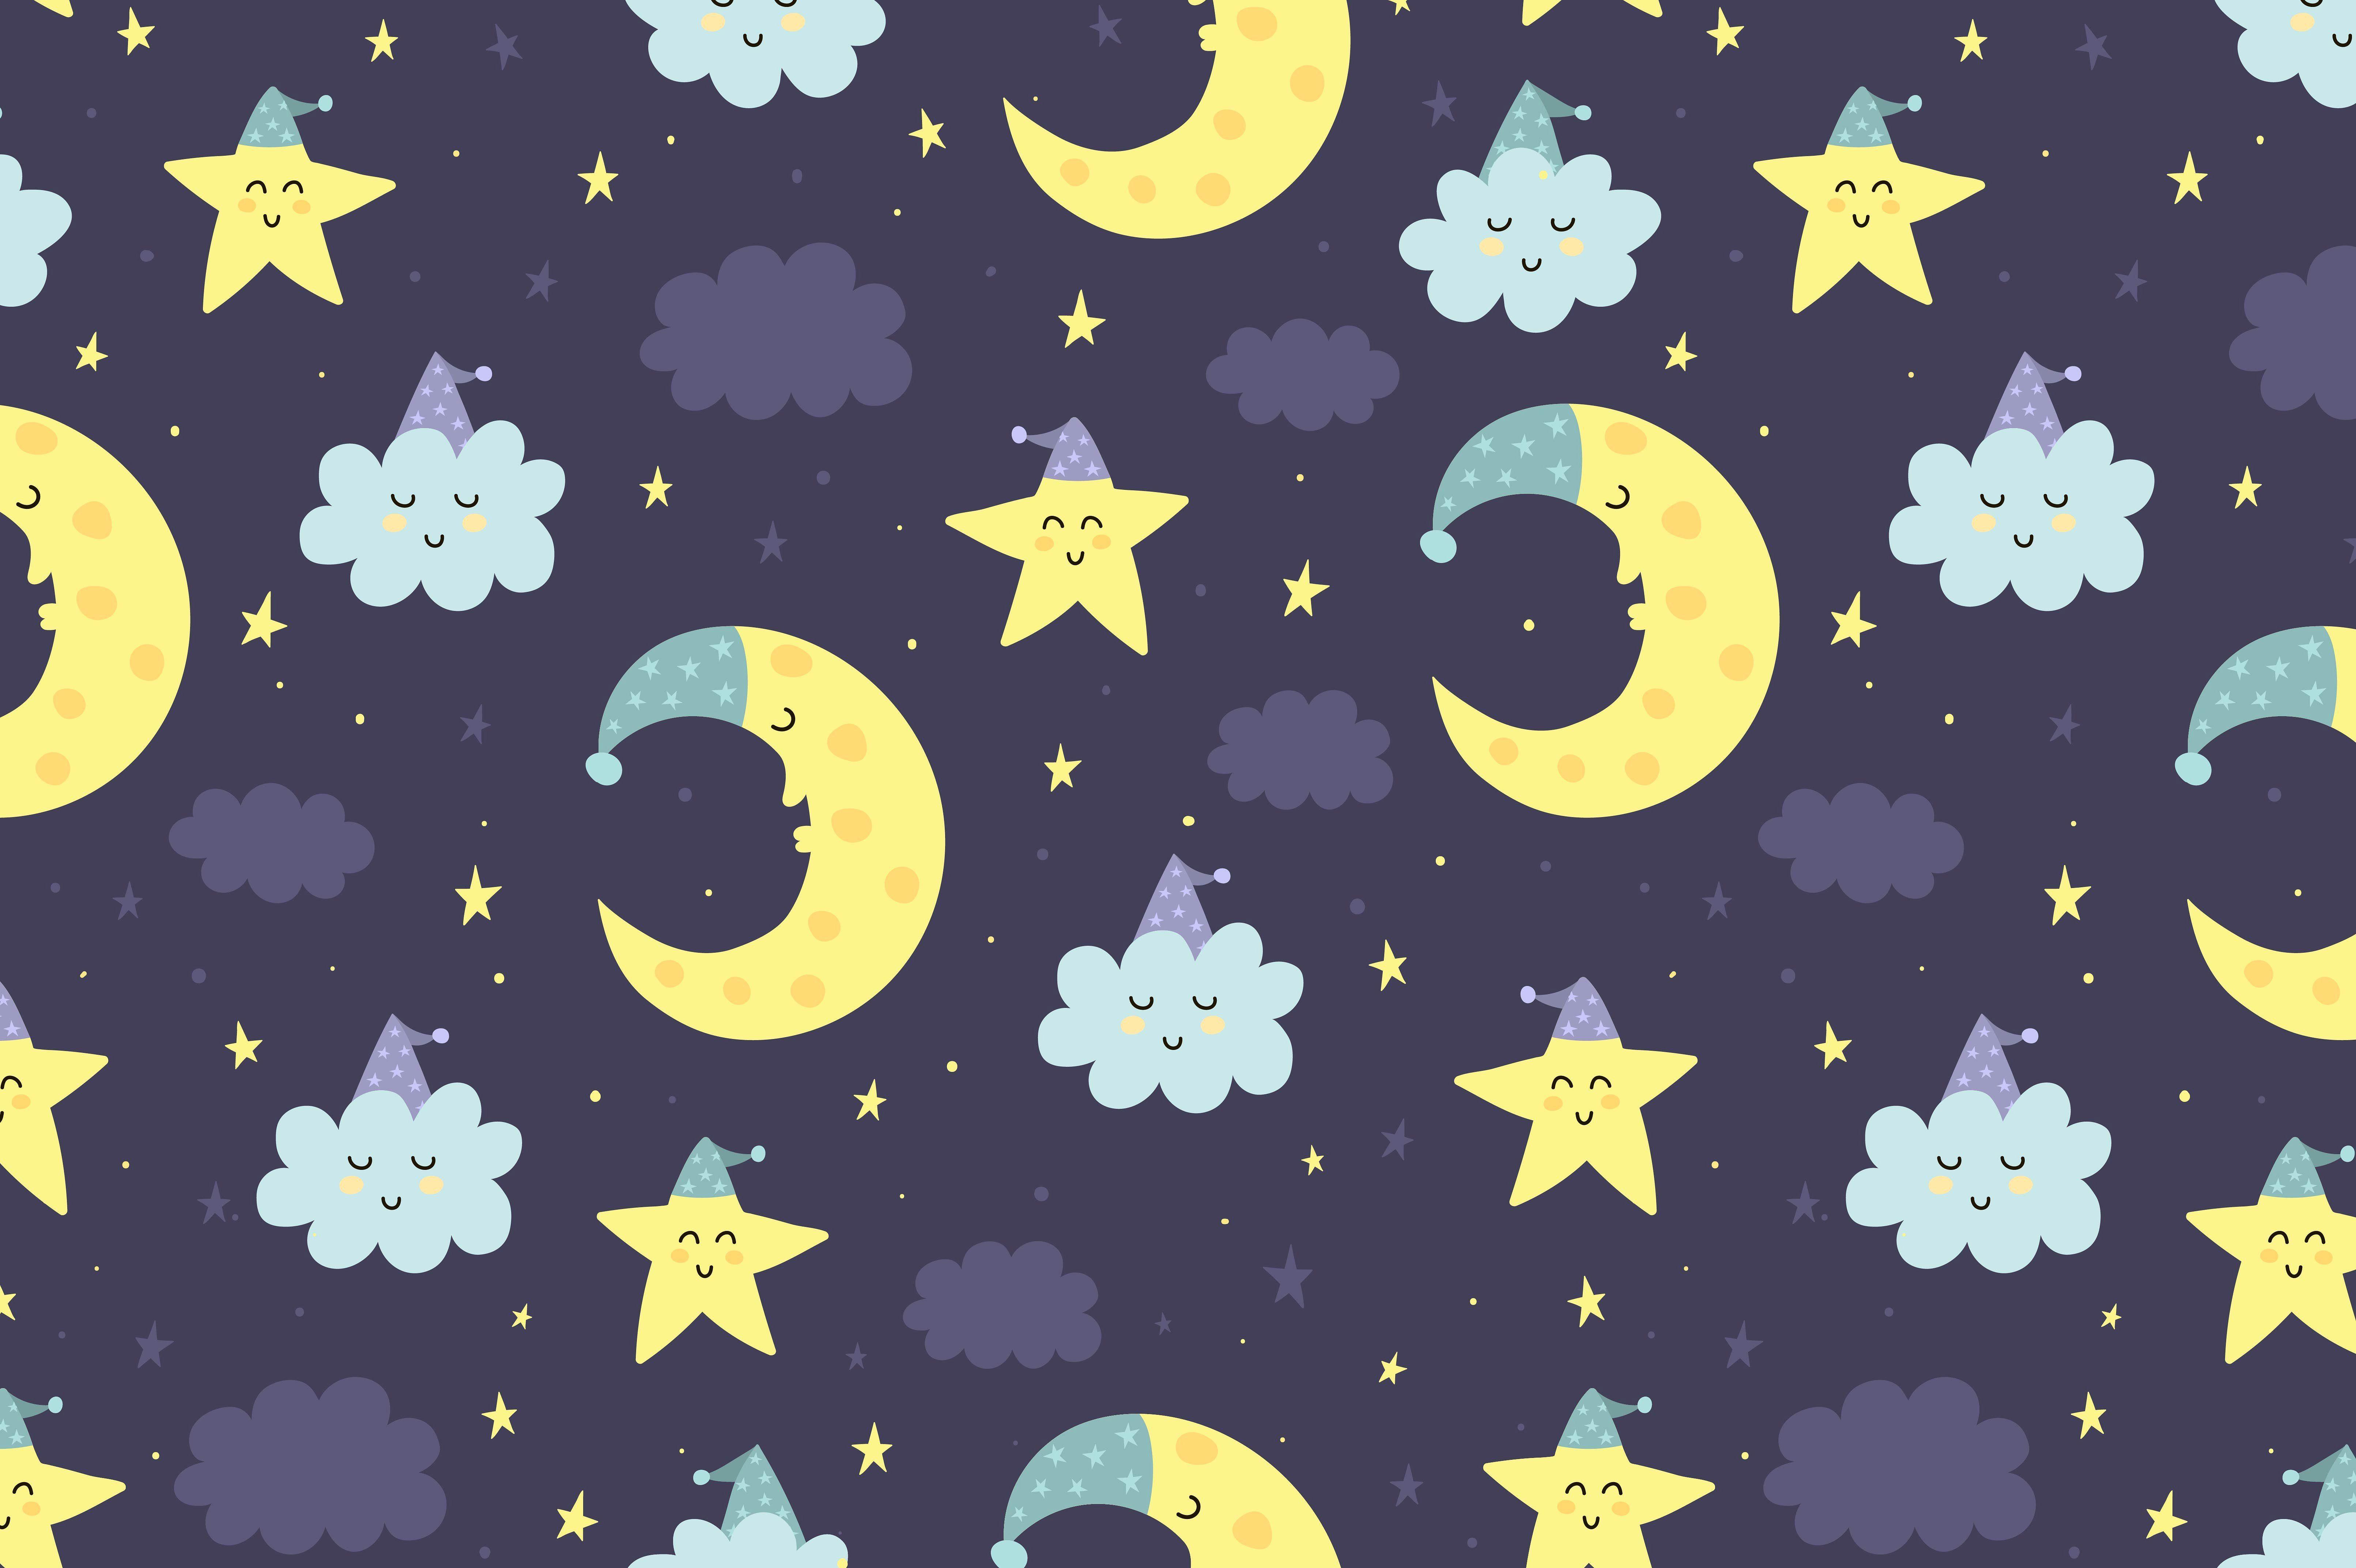 Good Night Vol 2 Patterns Cards Card Patterns Creative Illustration Dream Background